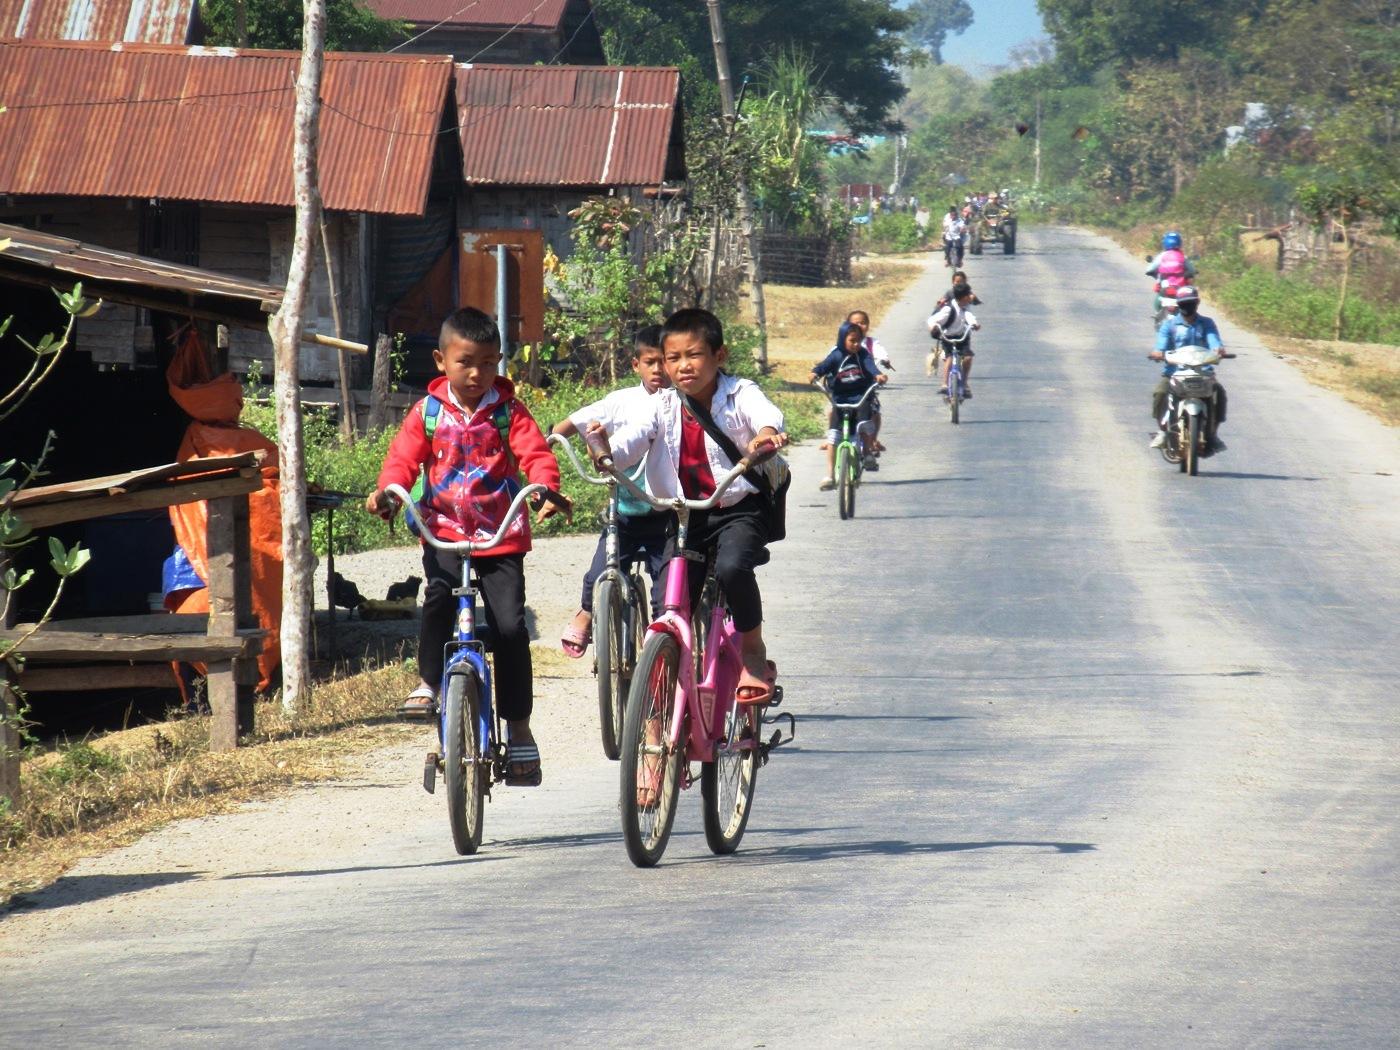 2019-12-laos-thakhek-loop-dia-4-09-carretera